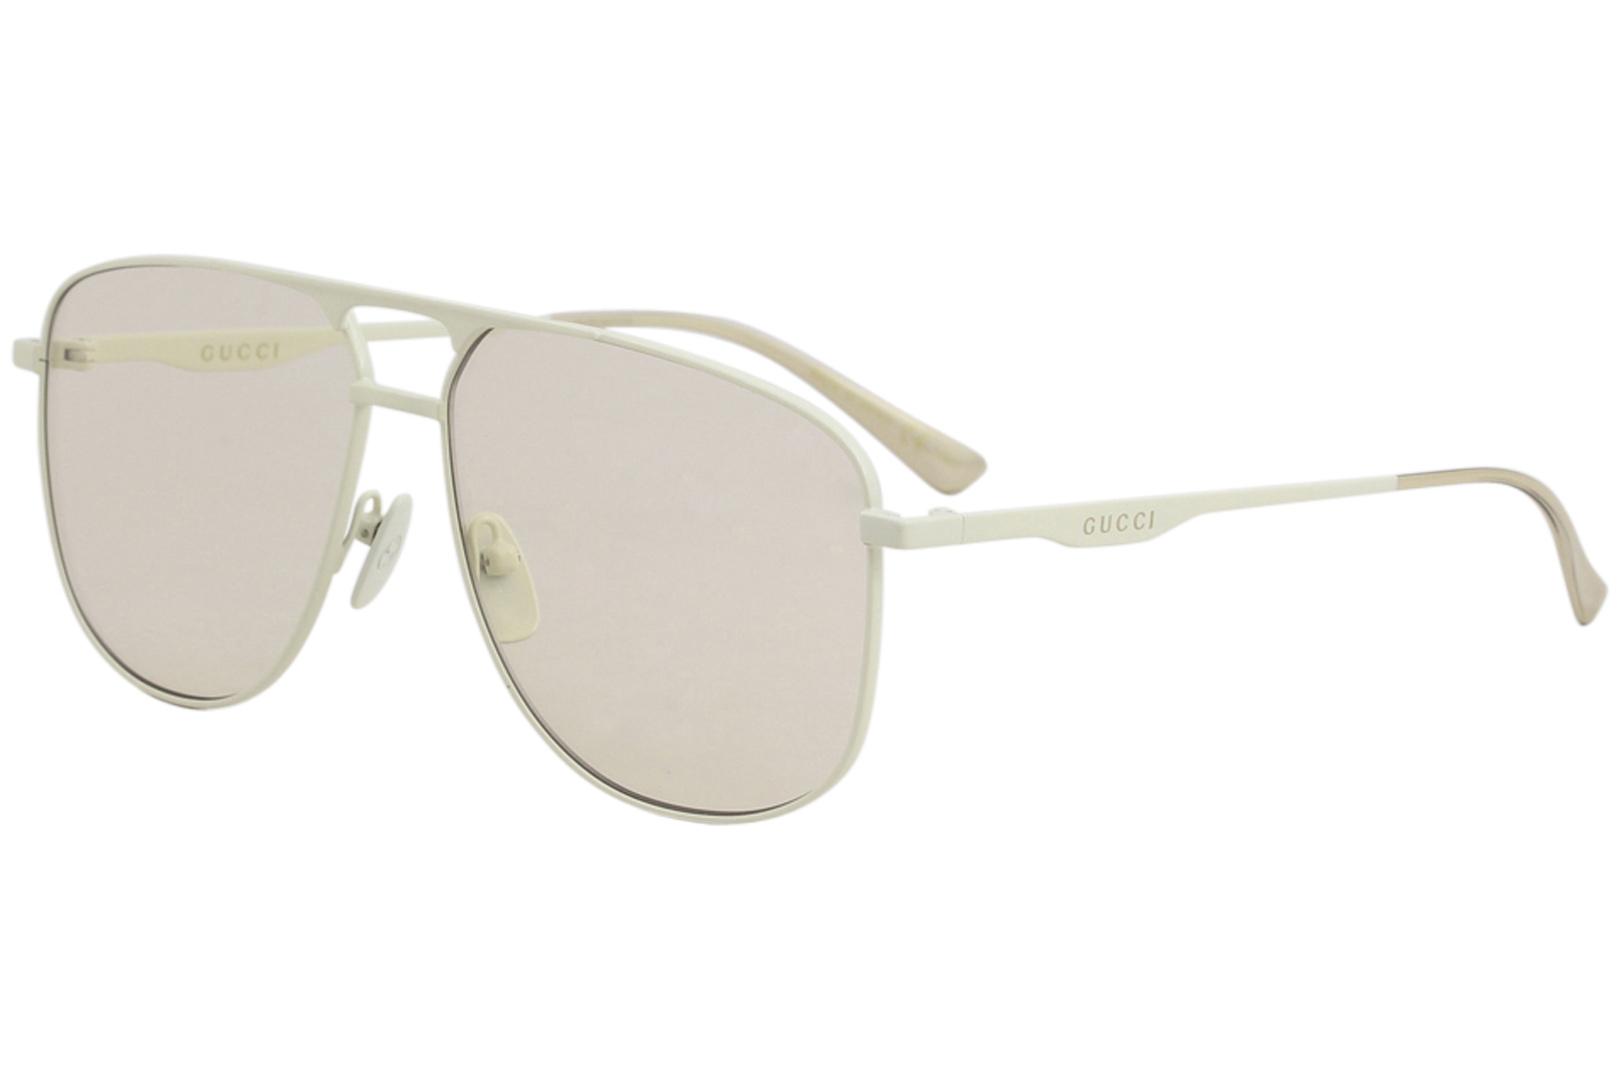 c167f93441b Gucci Men s GG0336S GG 0336 S 006 Ivory Fashion Pilot Sunglasses ...